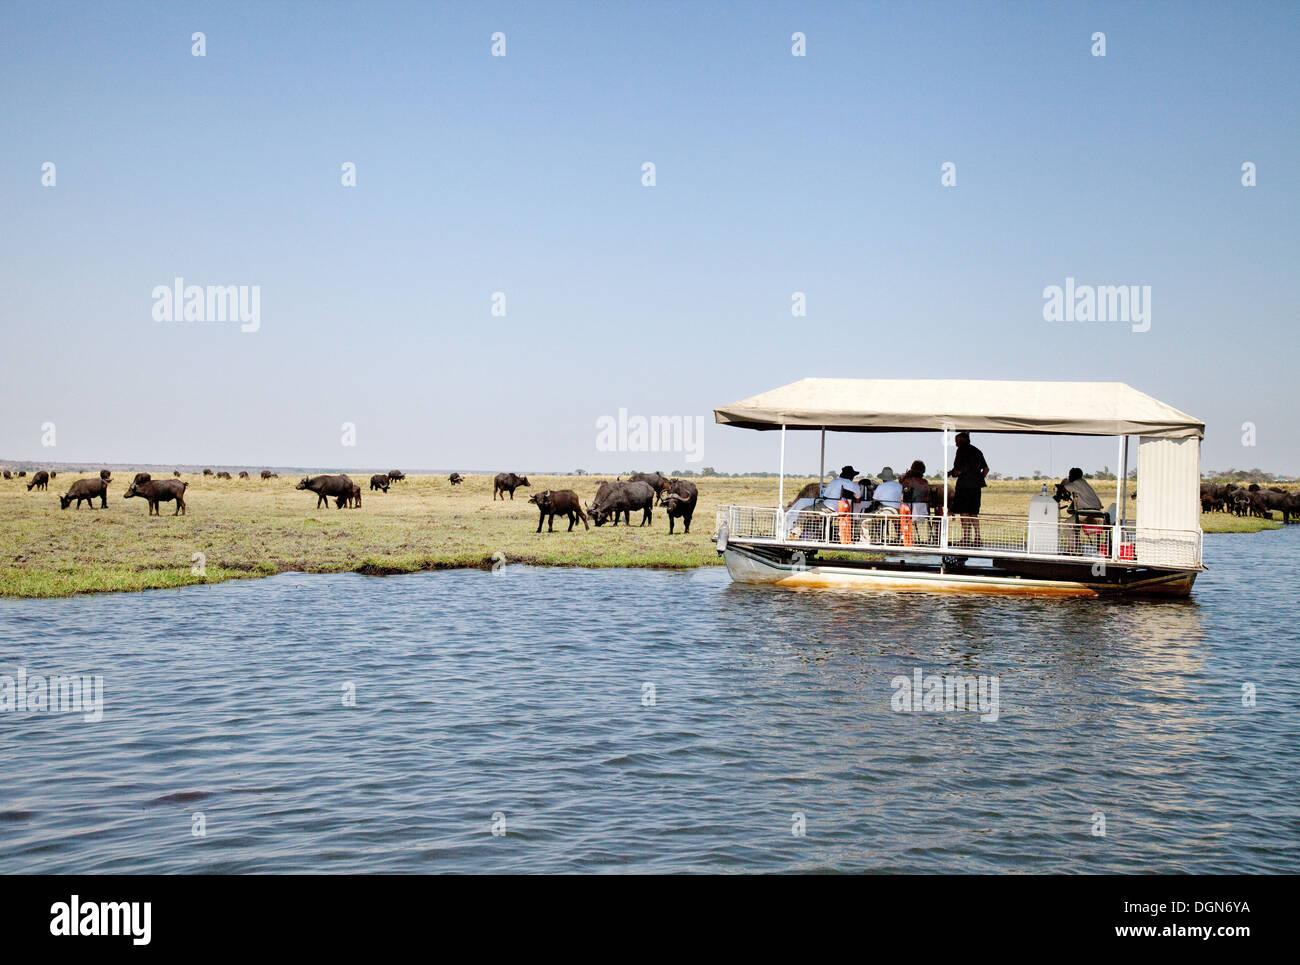 Tourists on a Chobe river cruise safari watching a herd of buffalo, Chobe National Park, Botswana Africa - Stock Image